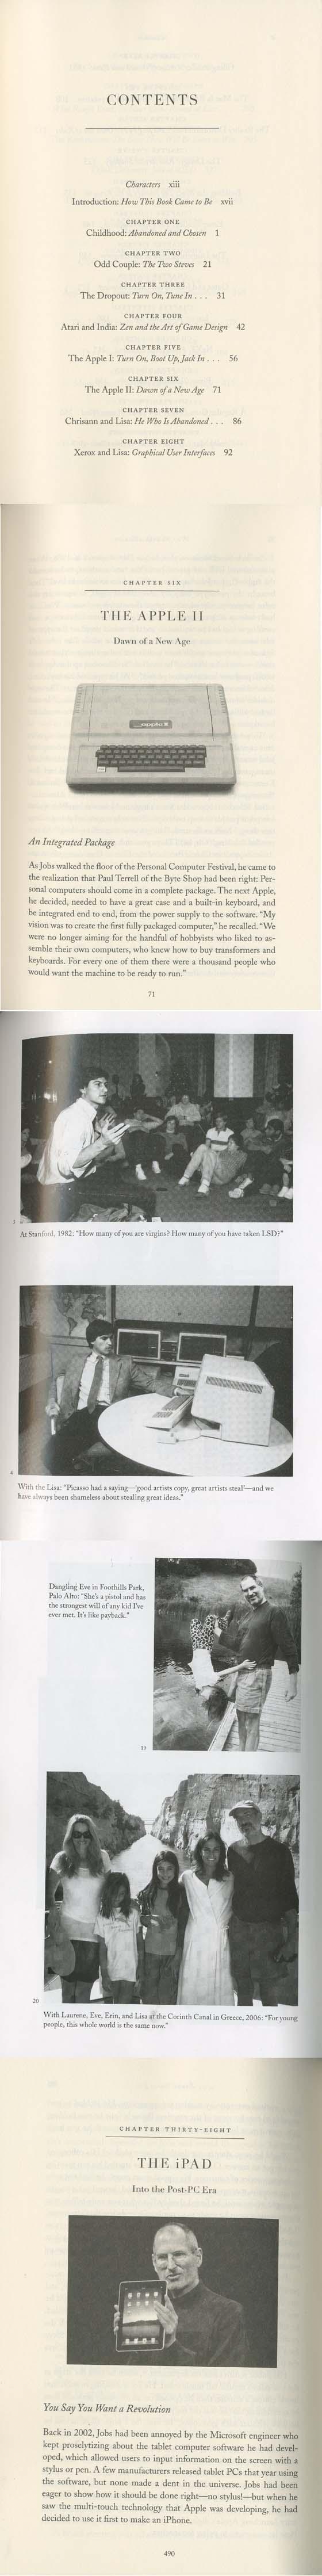 Steve Jobs - 스티브 잡스 자서전 도서 상세이미지